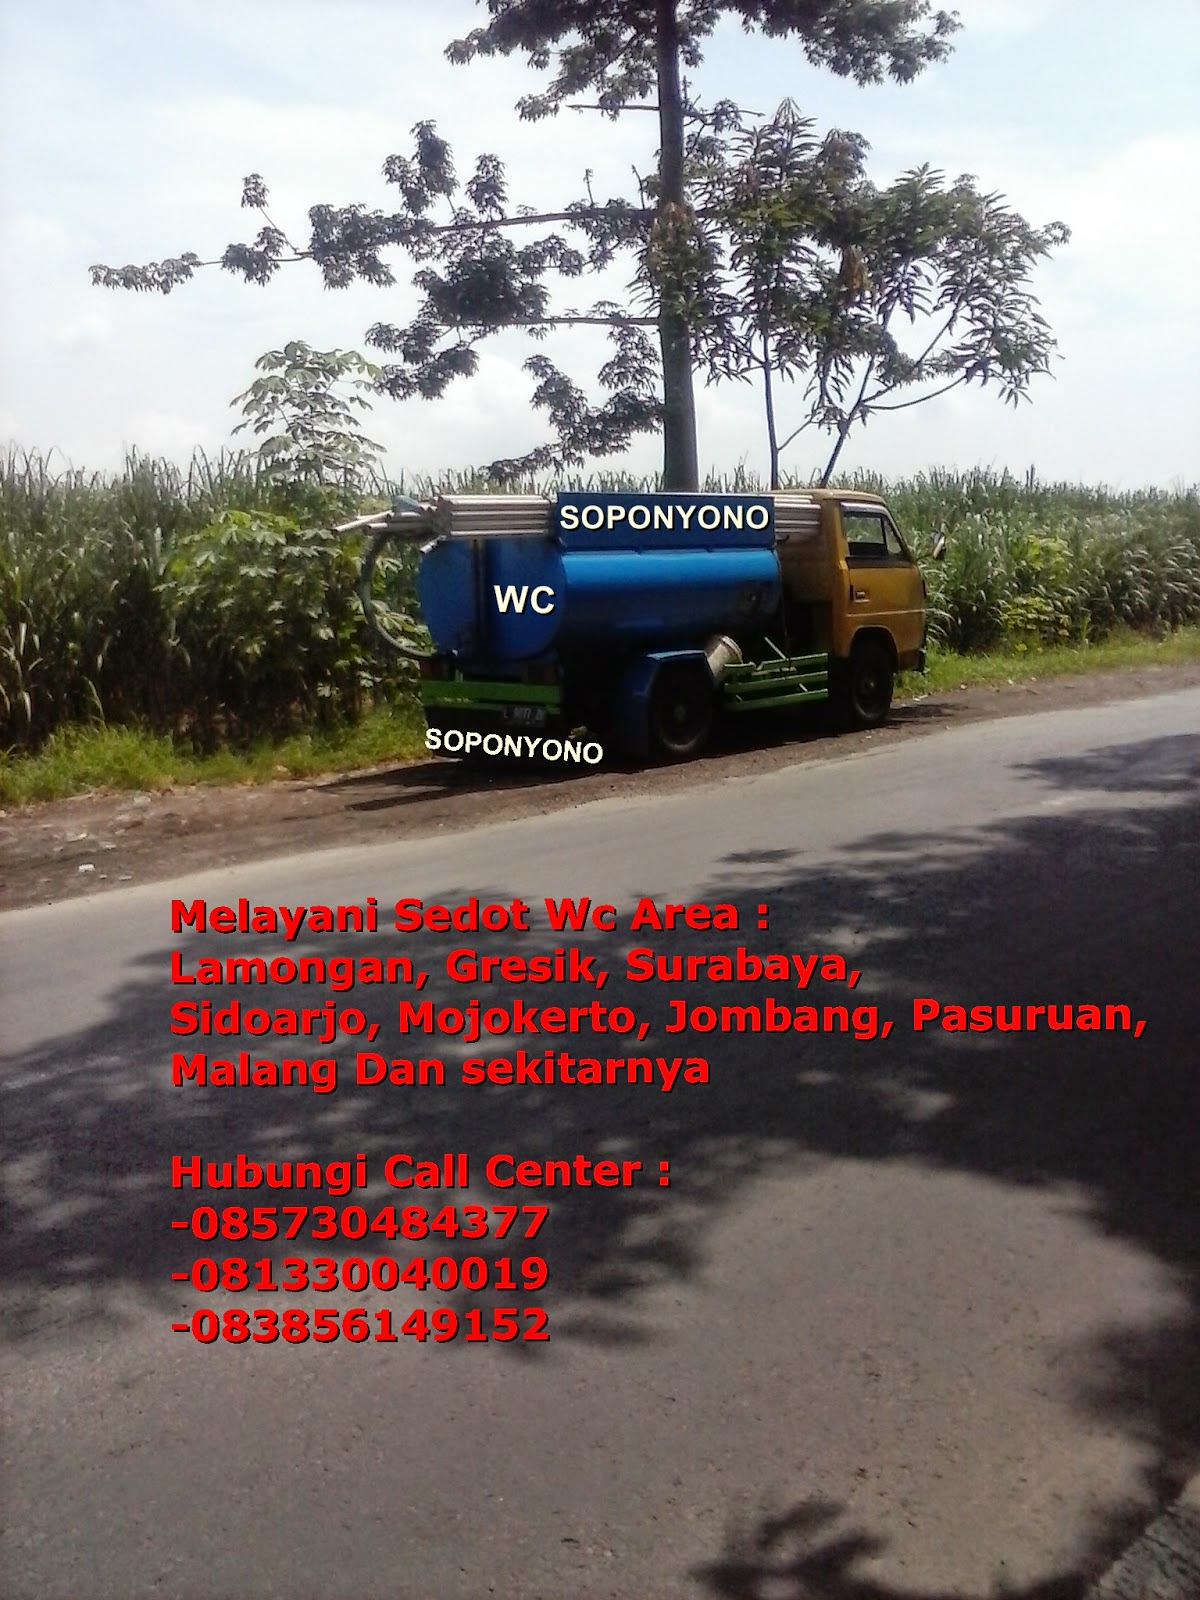 Sedot Wc dan Service Wc Blimbing, Malang || SOPONYONO